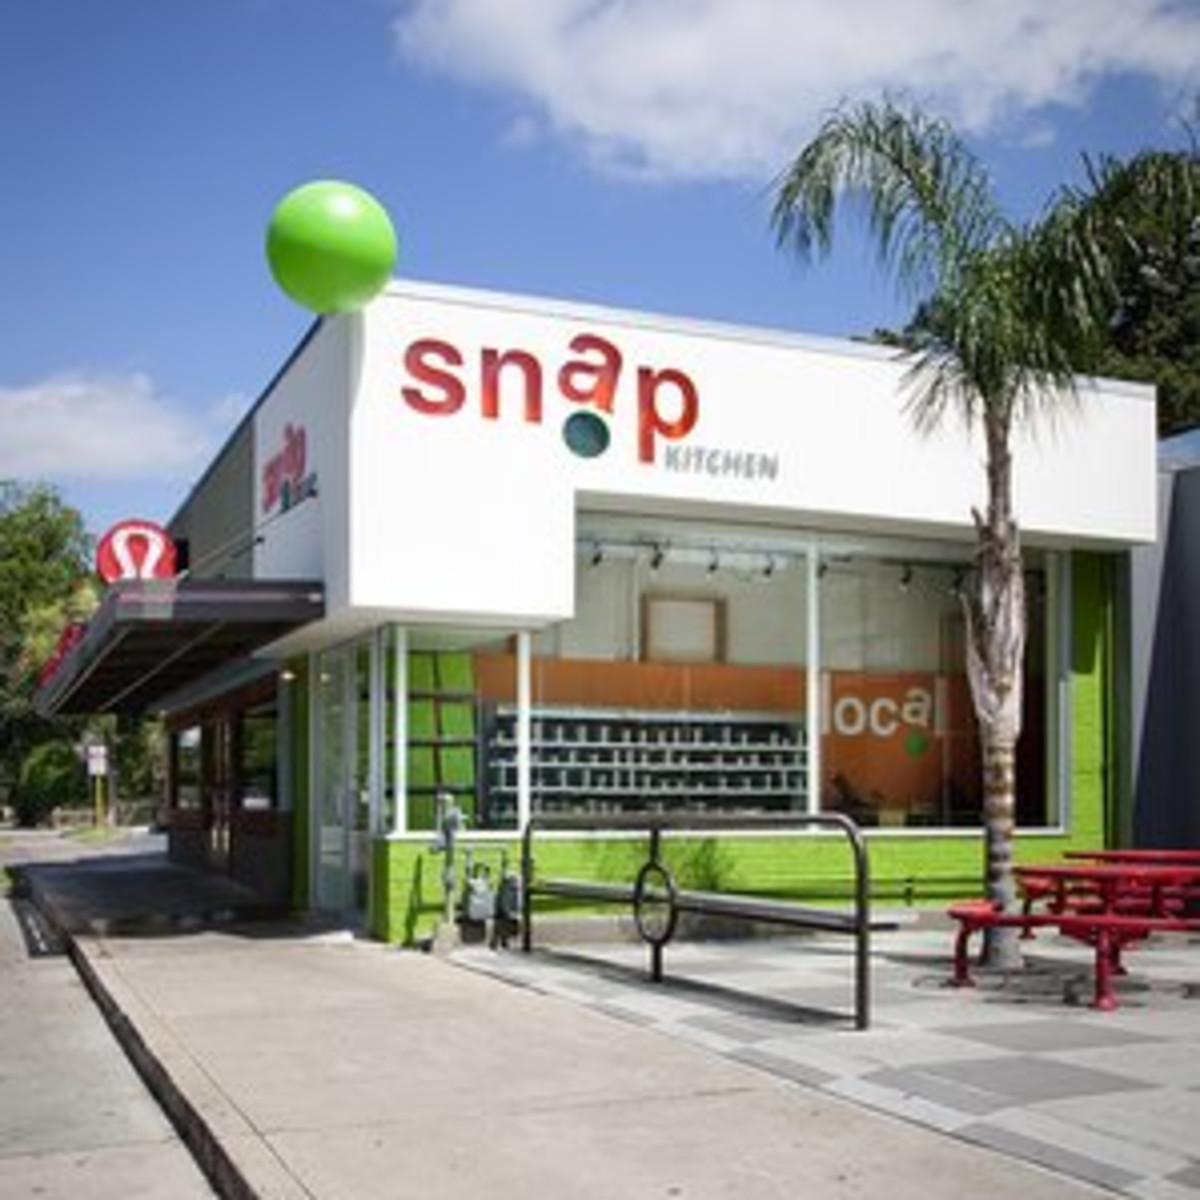 Austin_photo: places_food_snap kitchen_west sixth_exterior